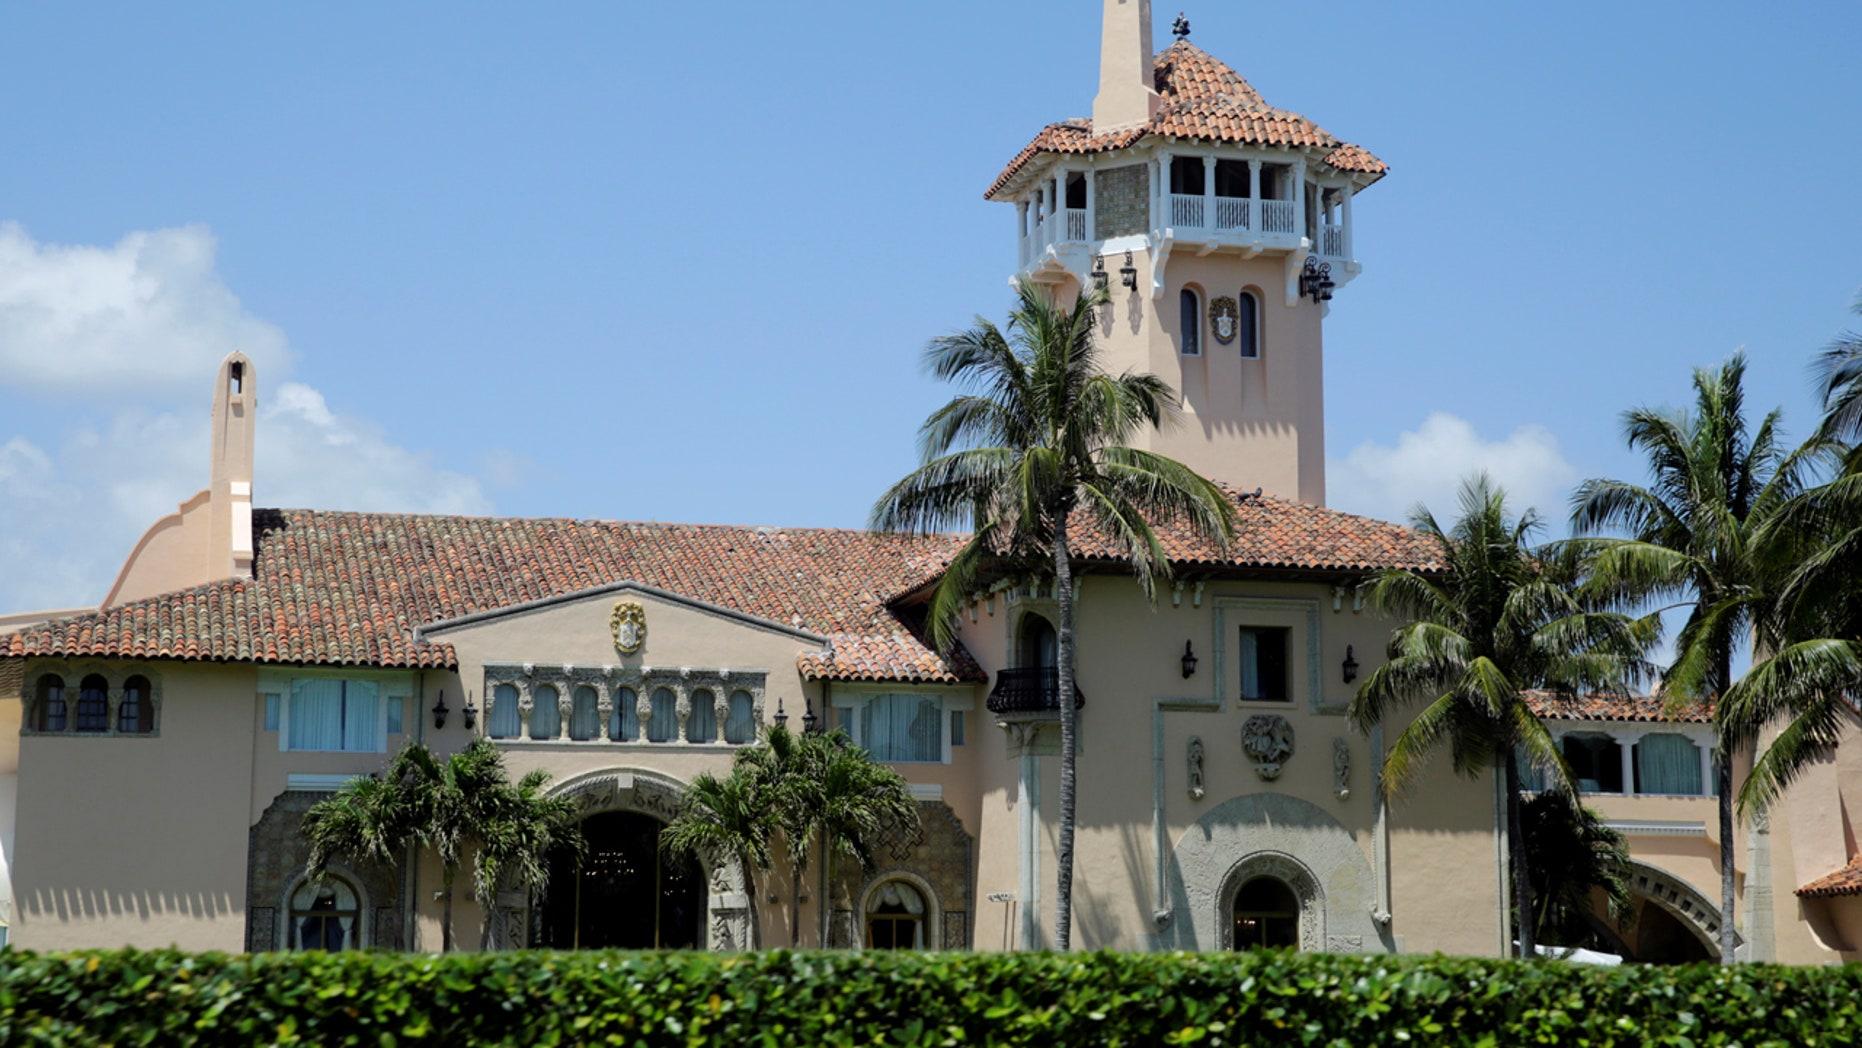 U.S. President Donald Trump's Mar-a-Lago estate is seen in Palm Beach